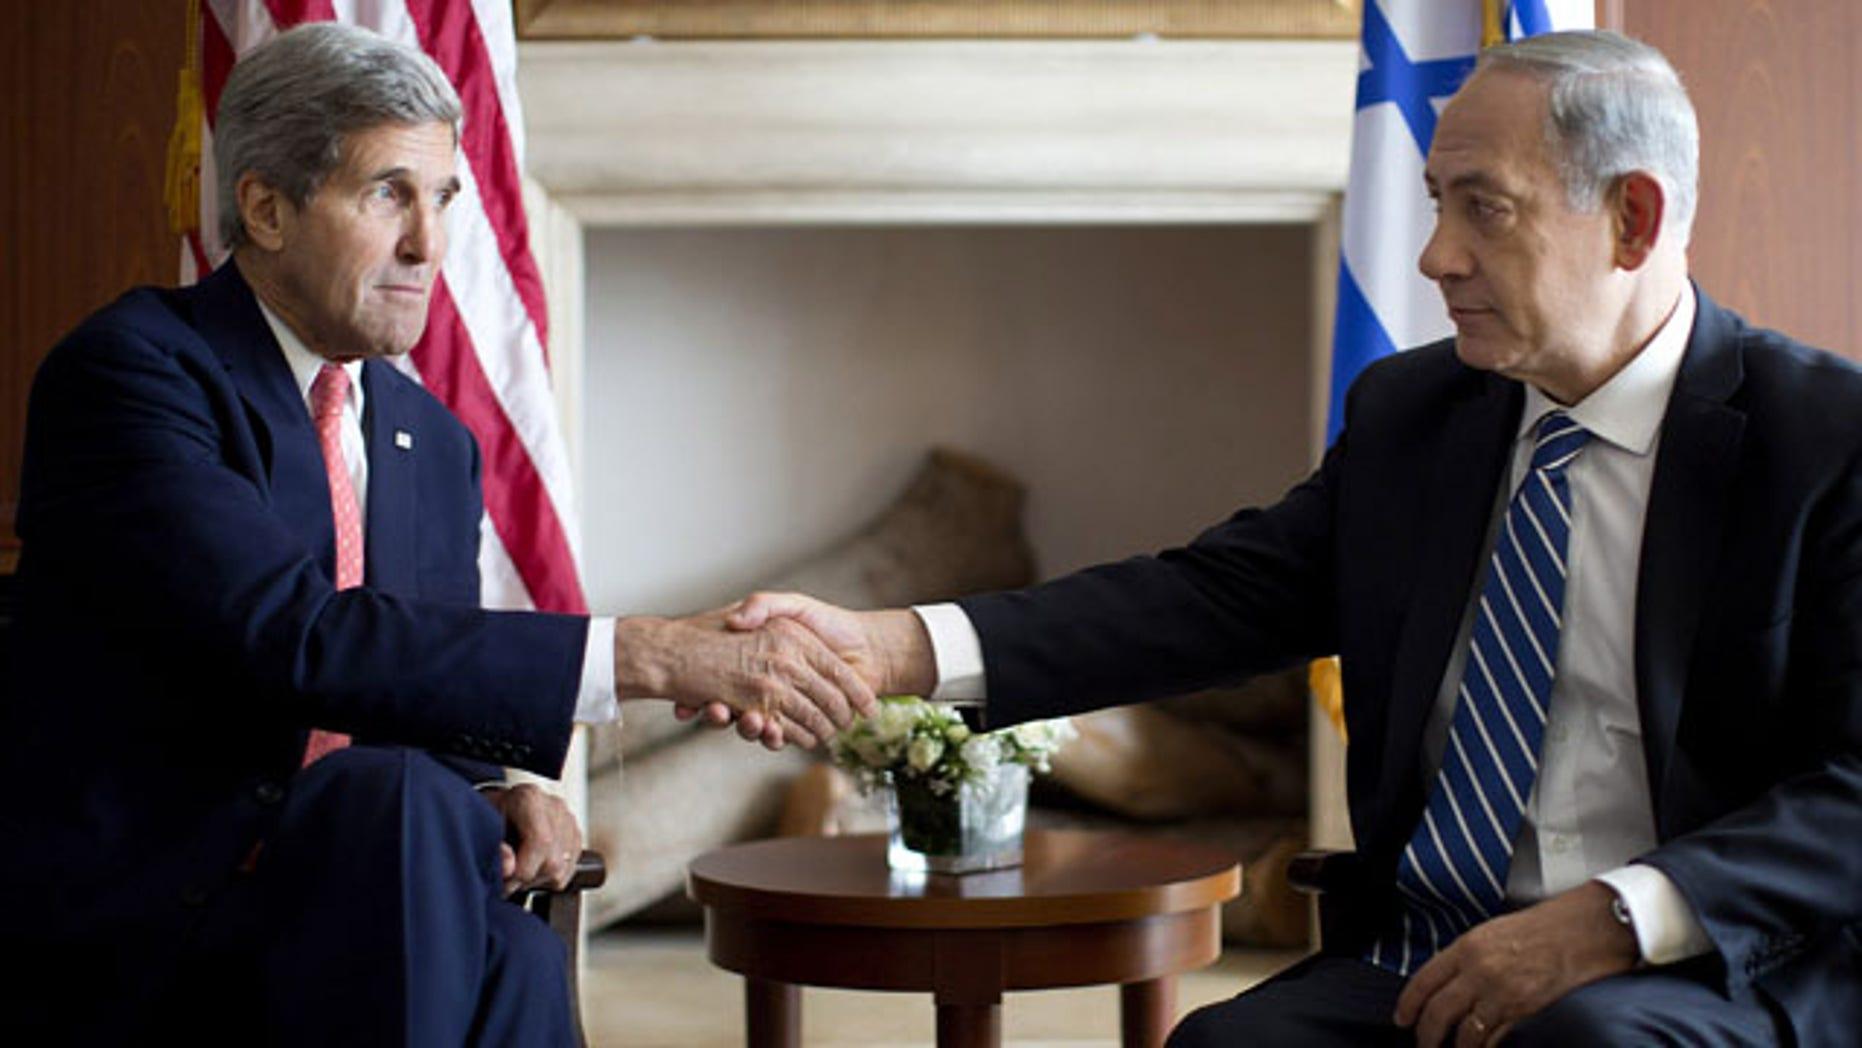 November 6, 2013: U.S. Secretary of State John Kerry, right, shakes hands with Israeli Prime Minister Benjamin Netanyahu in Jerusalem, Wednesday, Nov. 6, 2013. (AP Photo/Jason Reed, Pool)